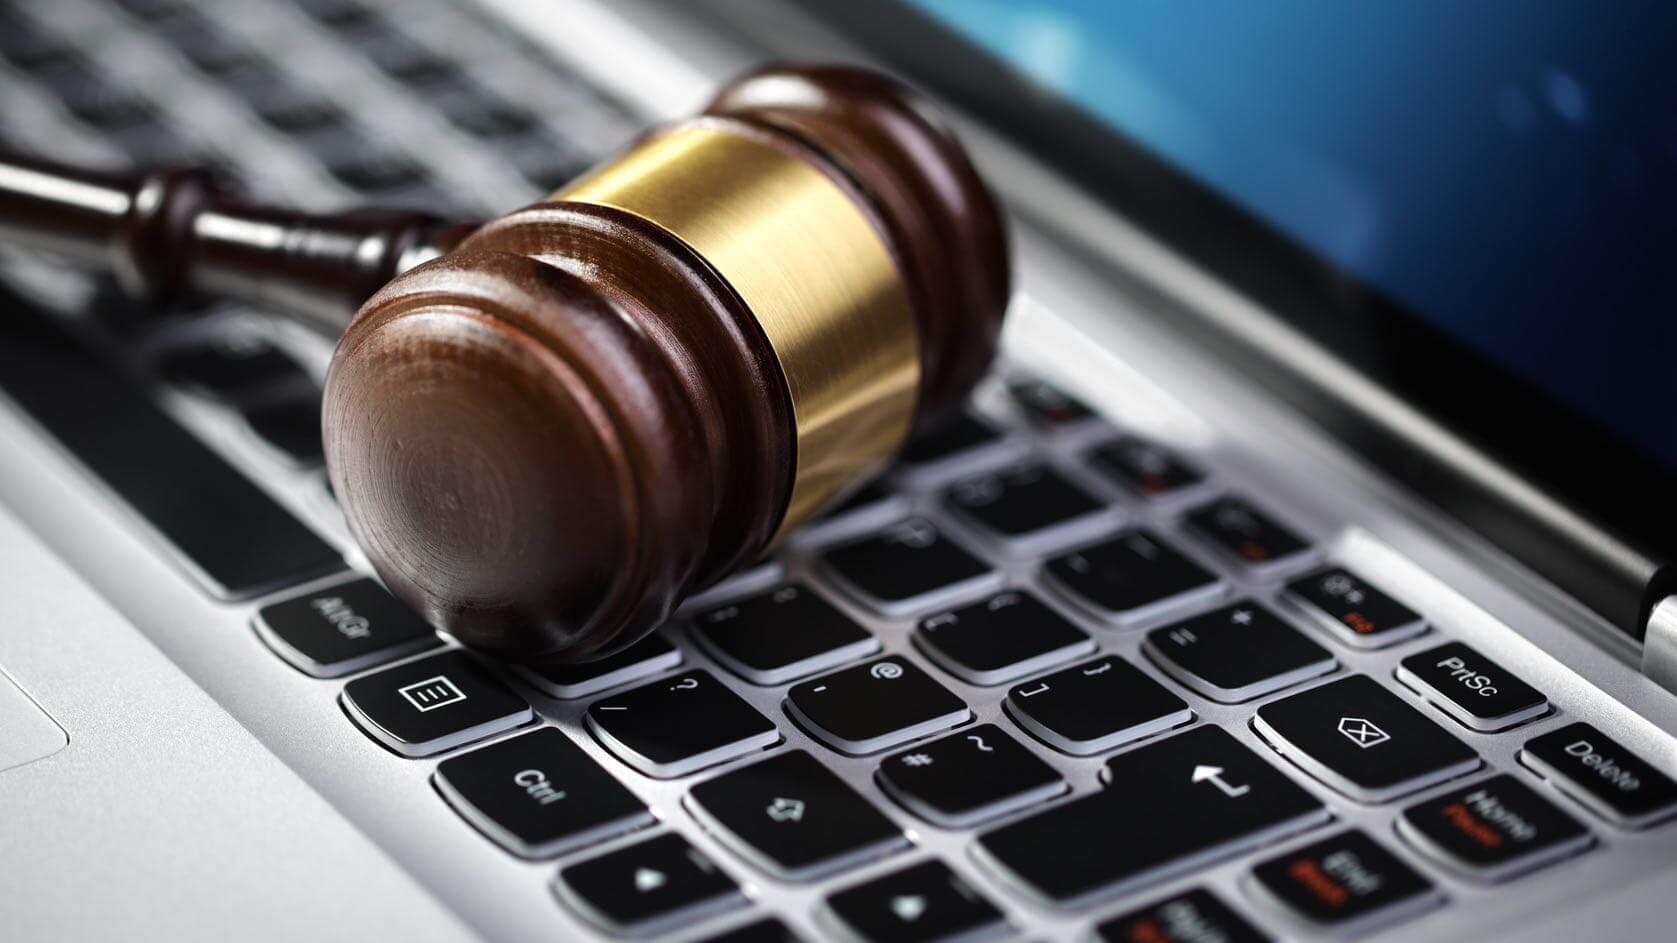 partnerbörsen im internet Bornheim